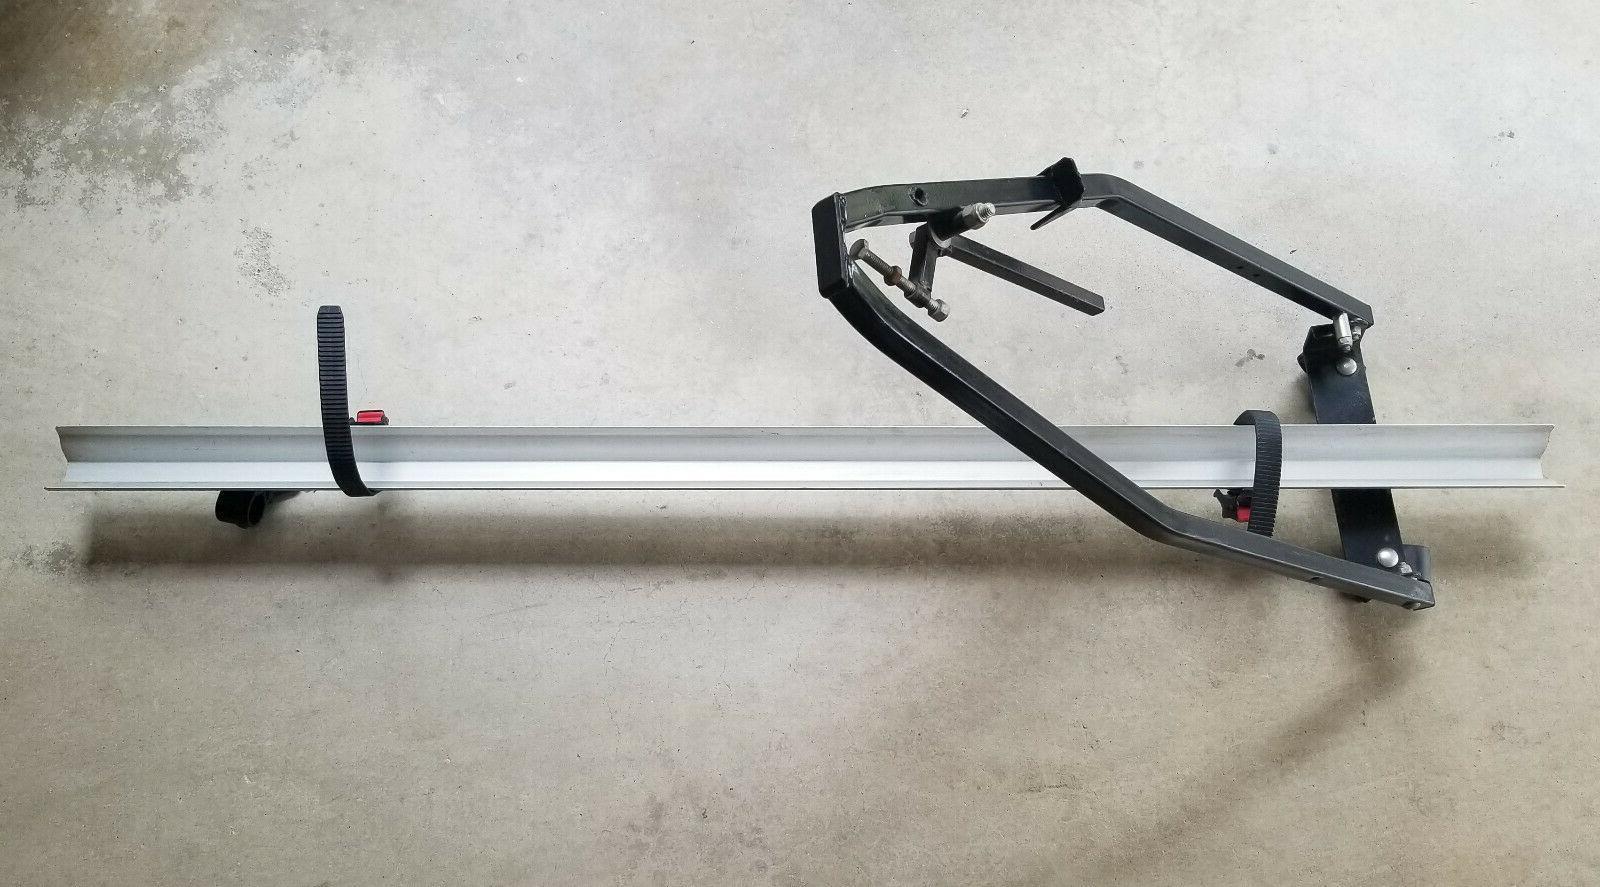 loadwarrior lockjaw upright mount bike rack c